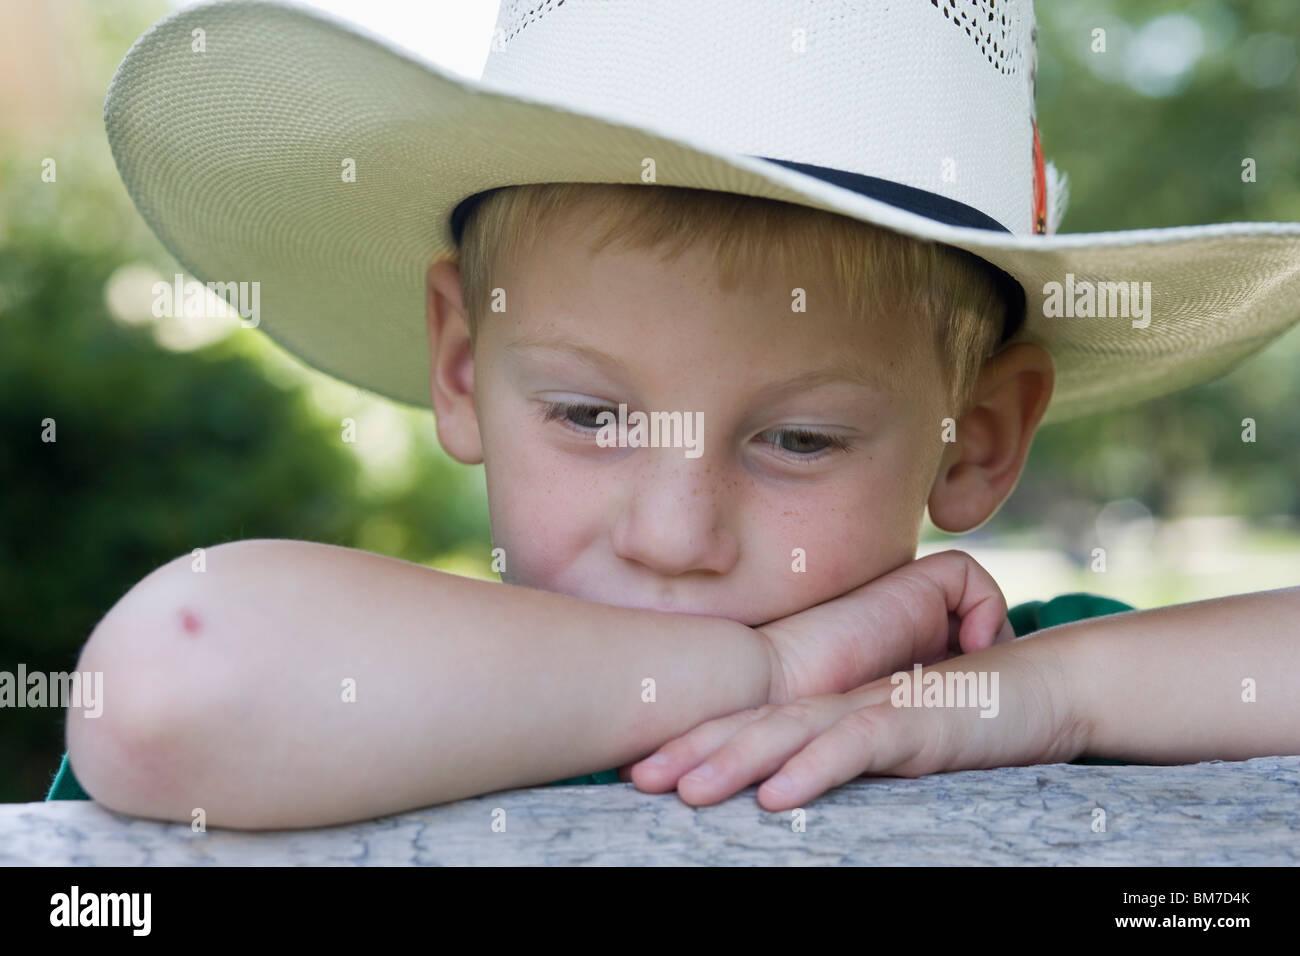 c27116ddb0087 Wearing A Cowboy Hat Stock Photos   Wearing A Cowboy Hat Stock ...